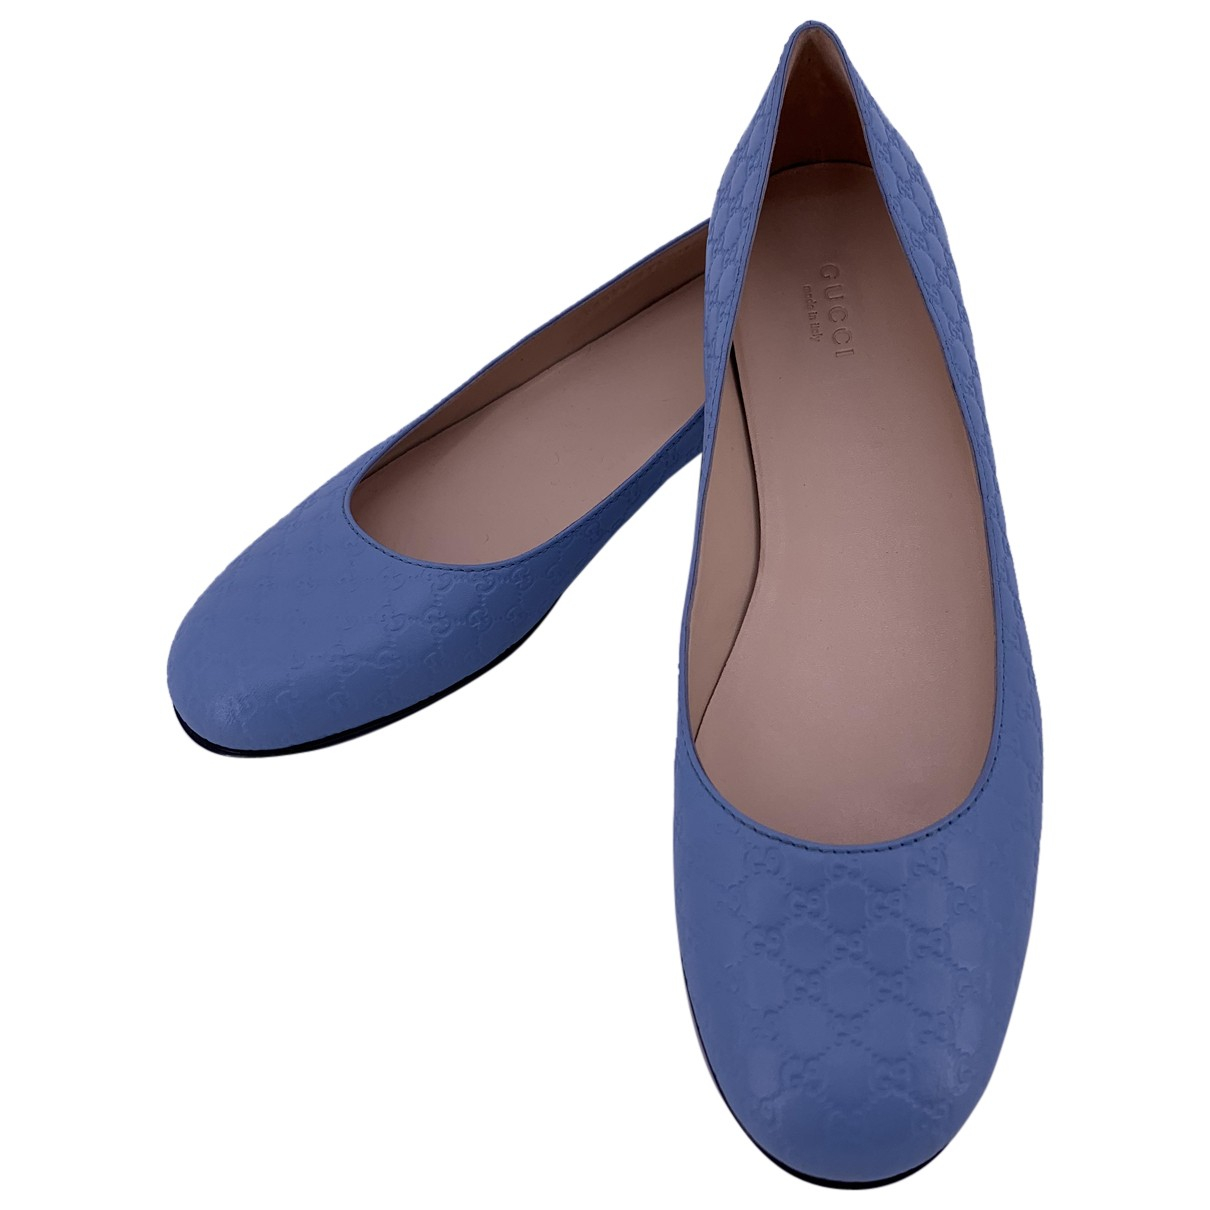 Gucci \N Ballerinas in  Blau Leder